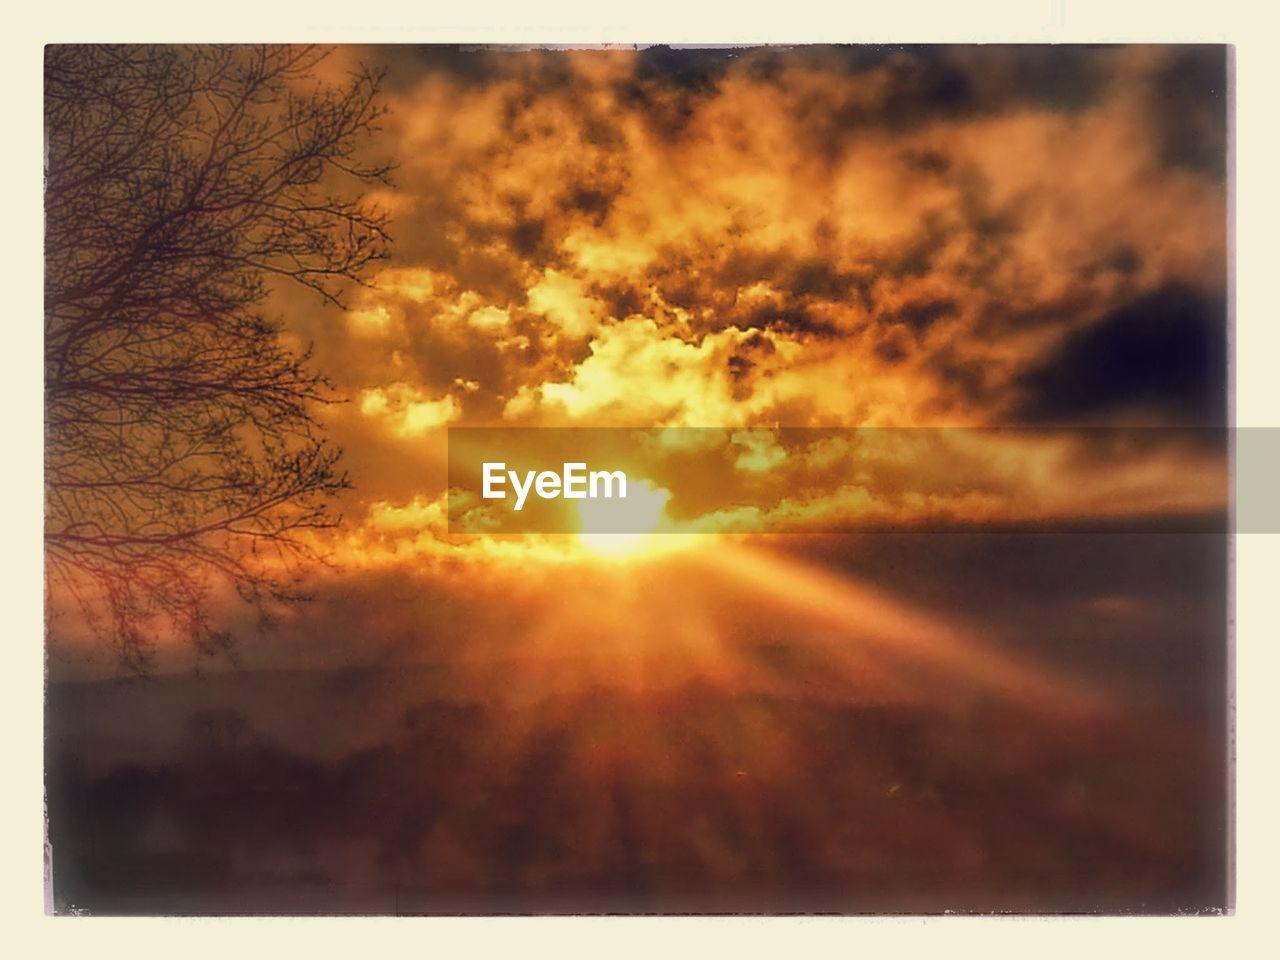 sun, nature, sunset, beauty in nature, sunlight, sunbeam, scenics, tranquil scene, tranquility, idyllic, bright, sky, majestic, outdoors, no people, day, tree